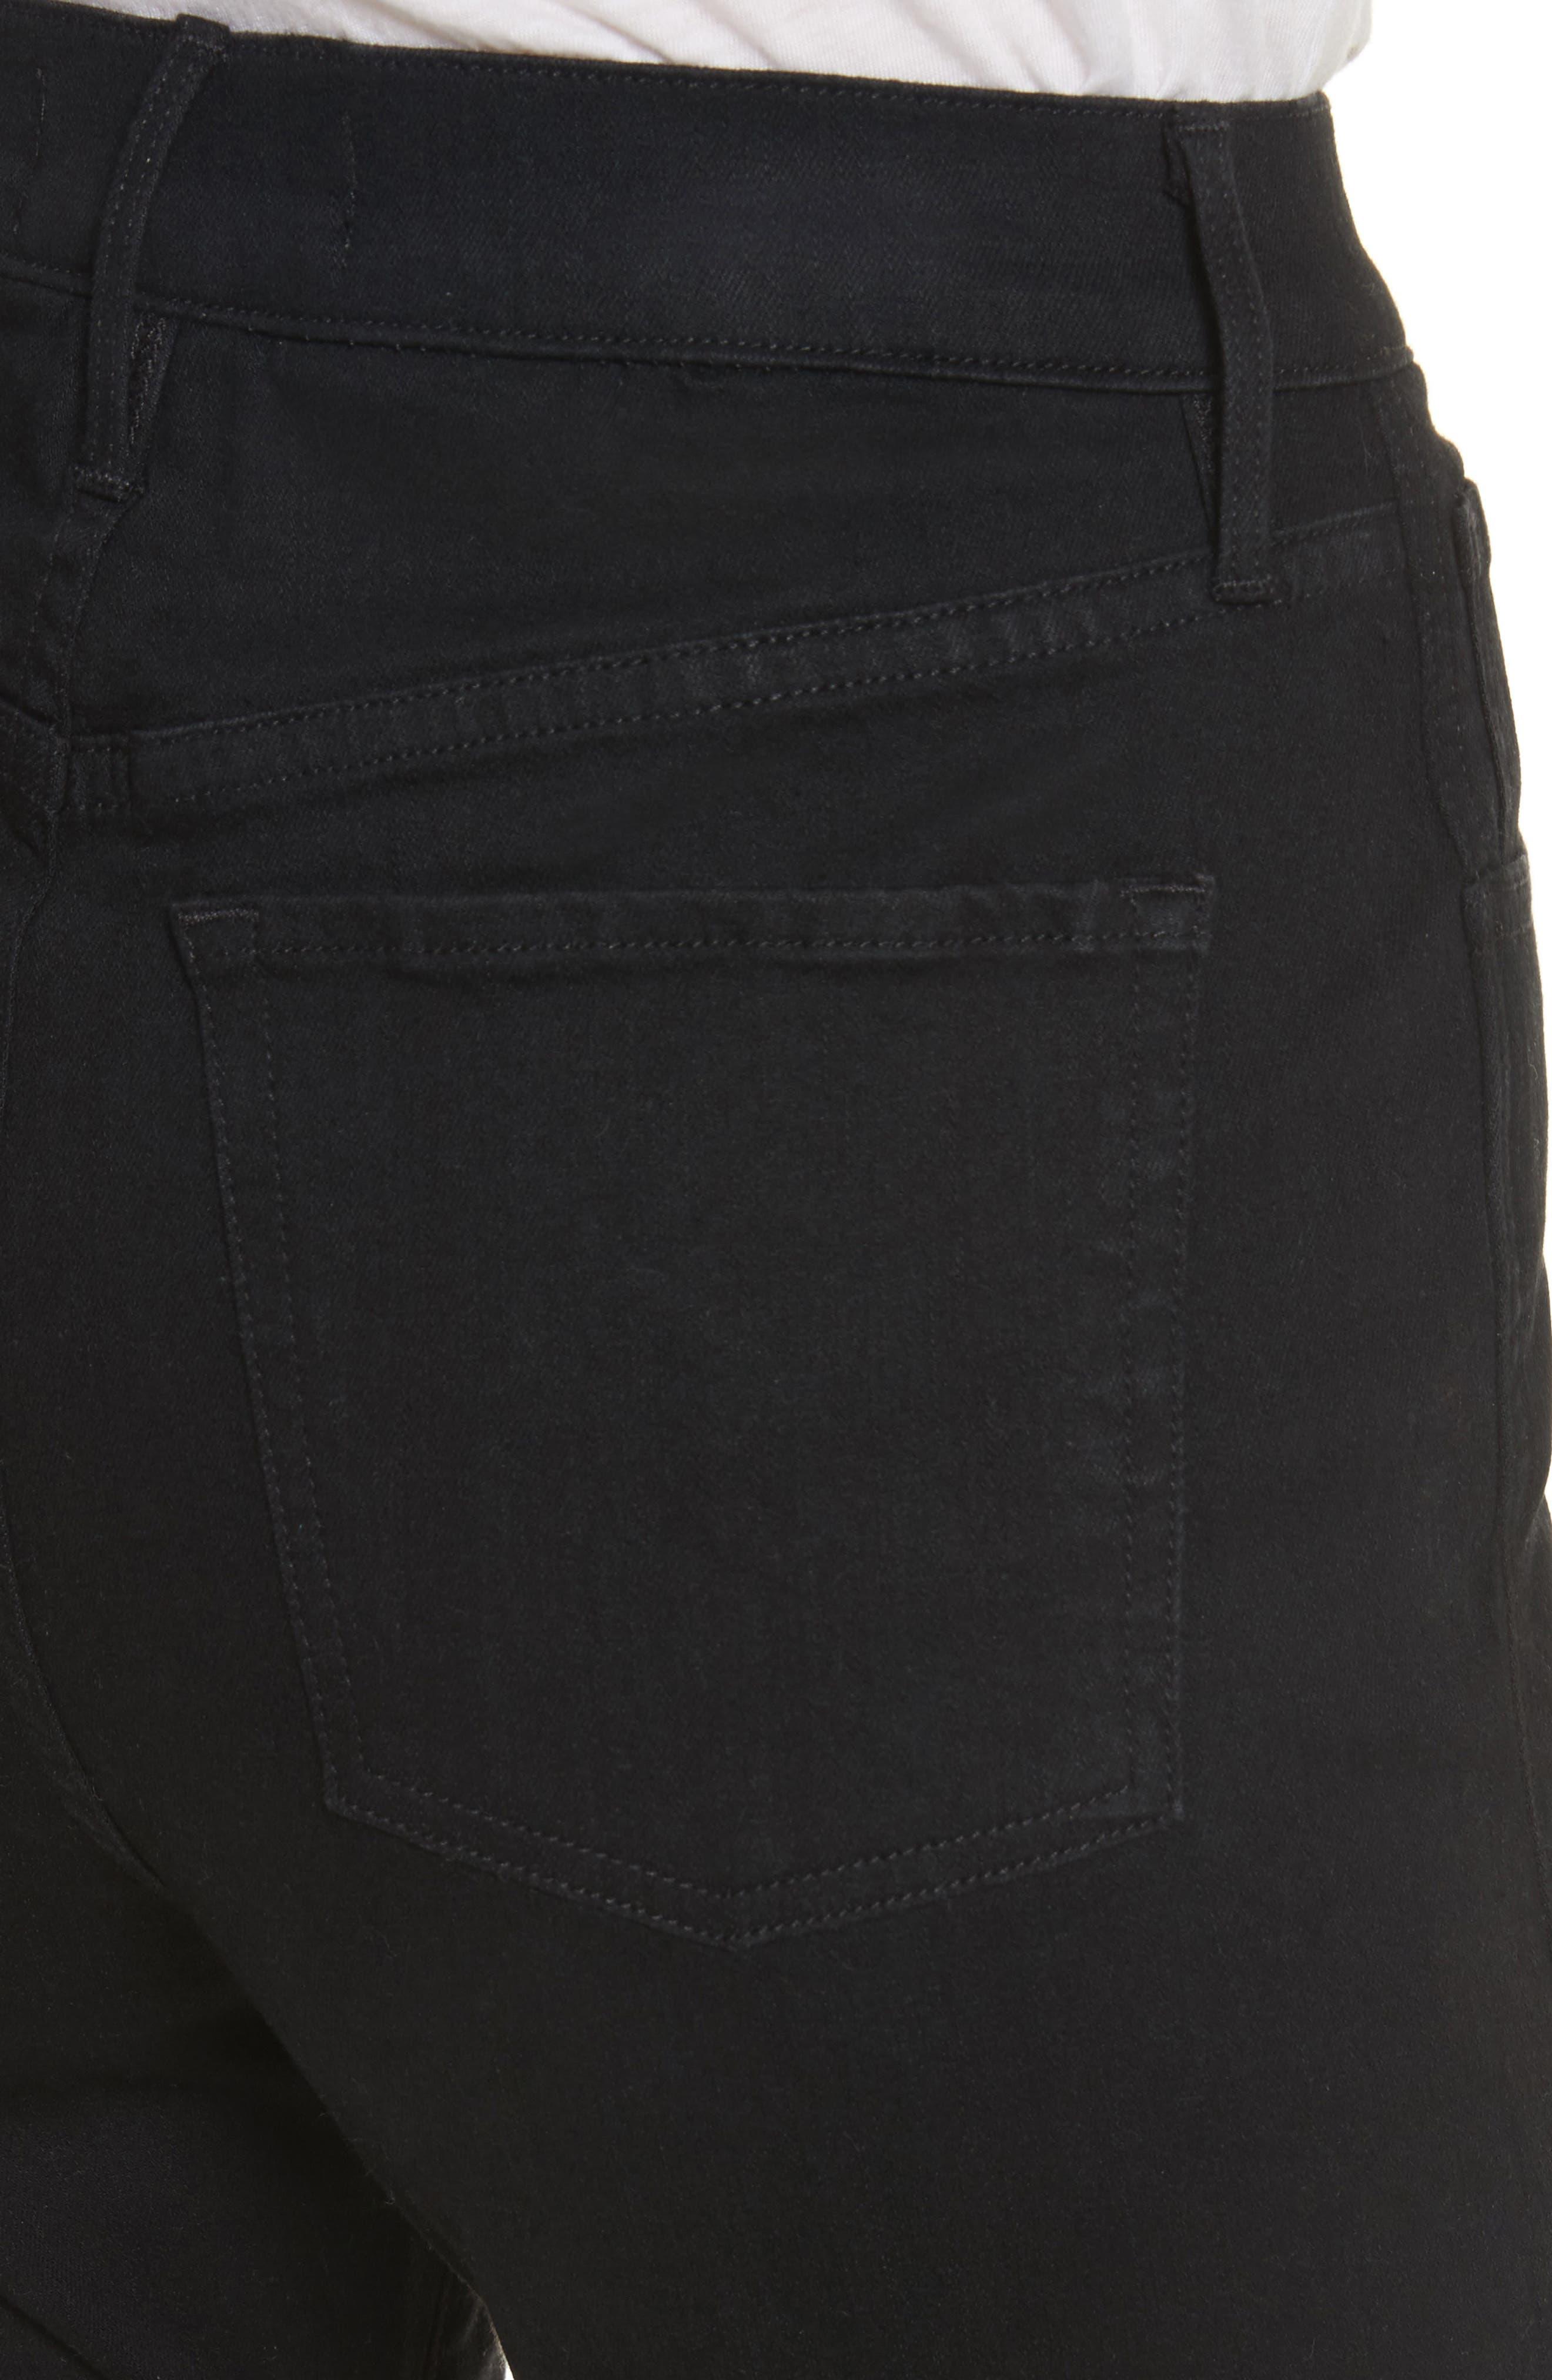 W4 Adeline High Waist Split Flare Jeans,                             Alternate thumbnail 4, color,                             Black No 1